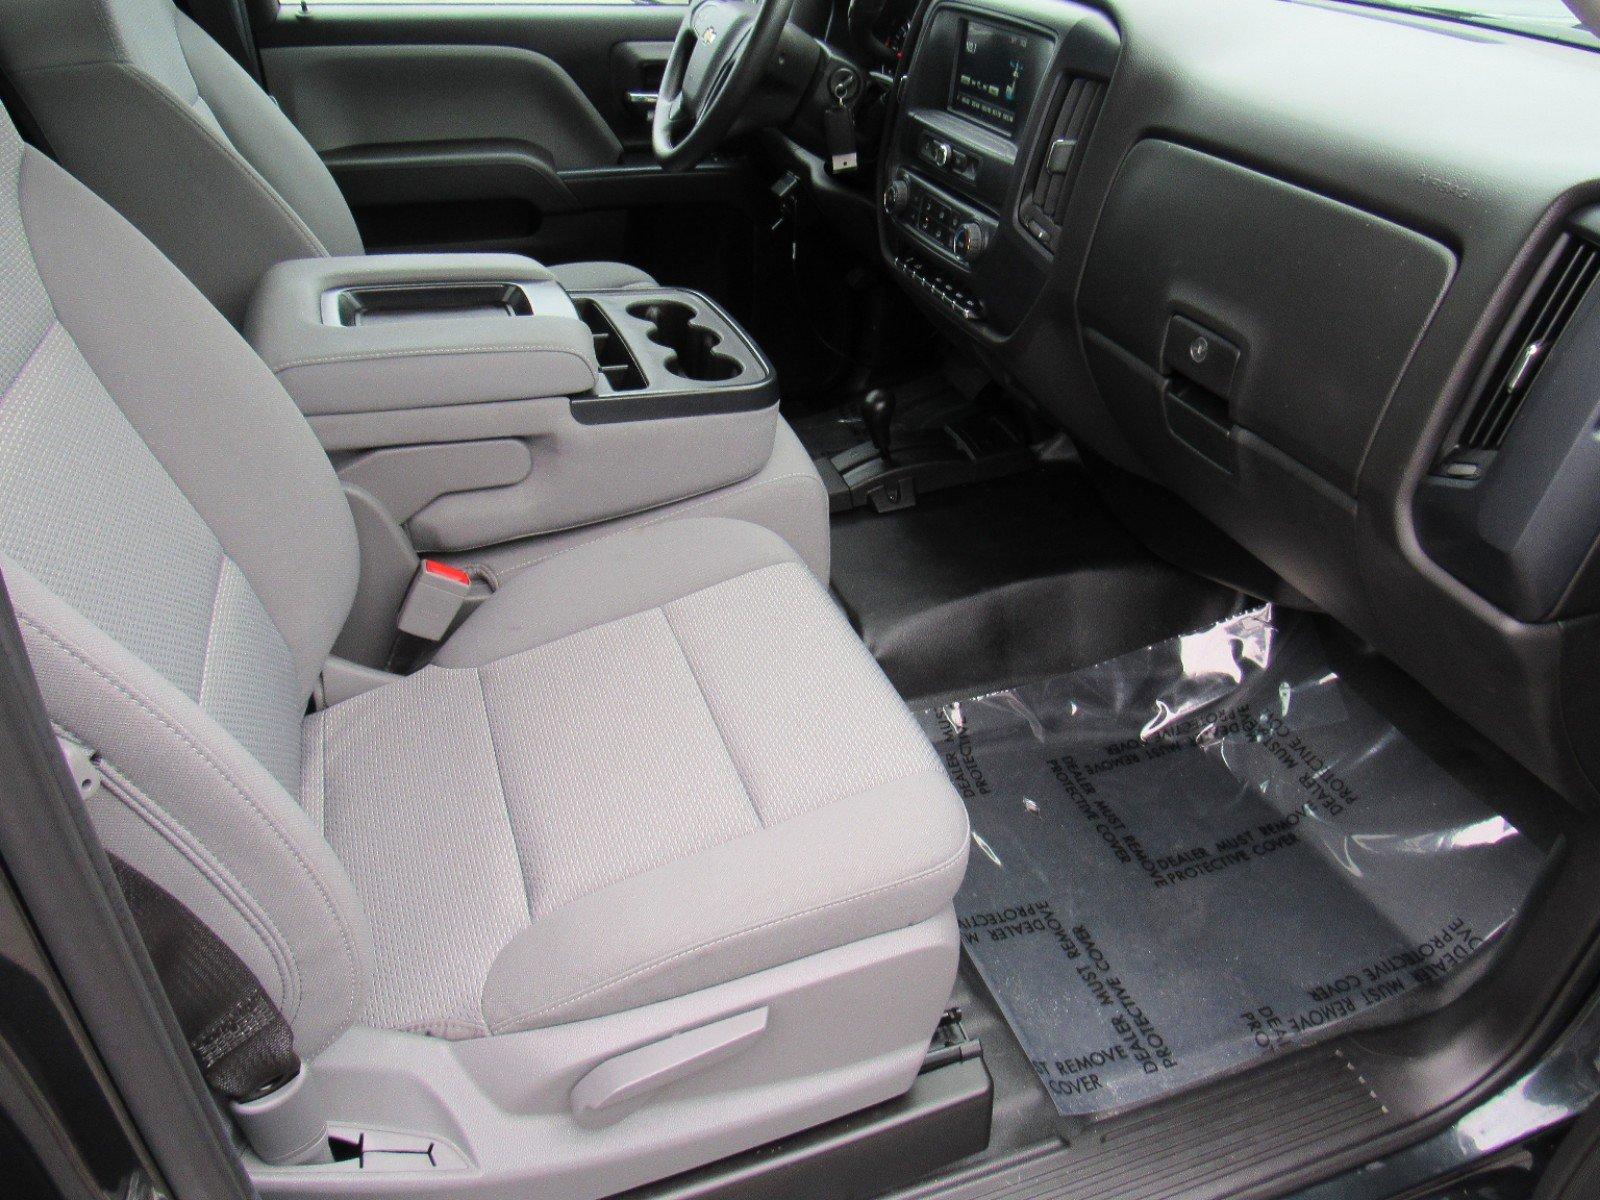 Used 2018 Chevrolet Silverado 2500HD For Sale New London CT | VIN